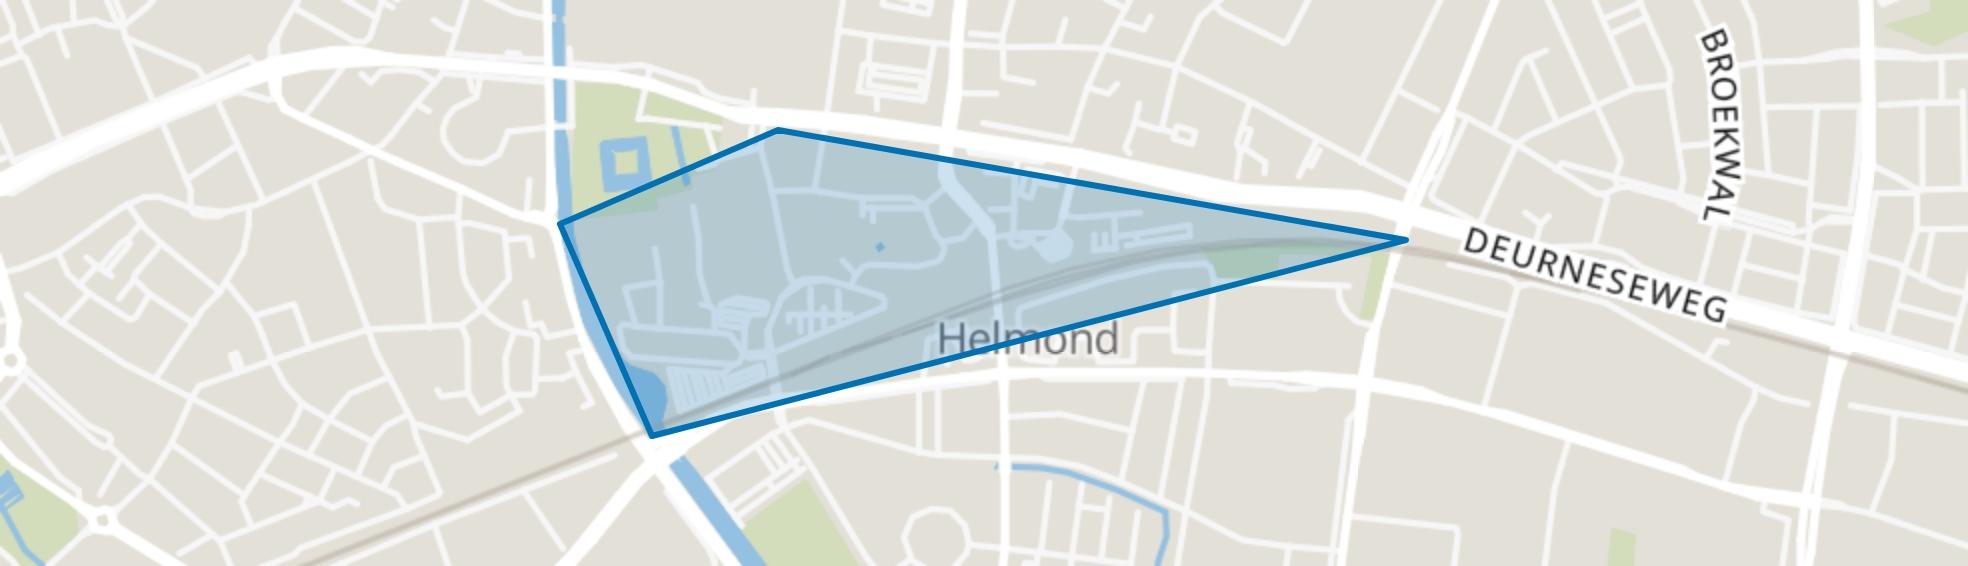 Stationsgebied, Helmond map